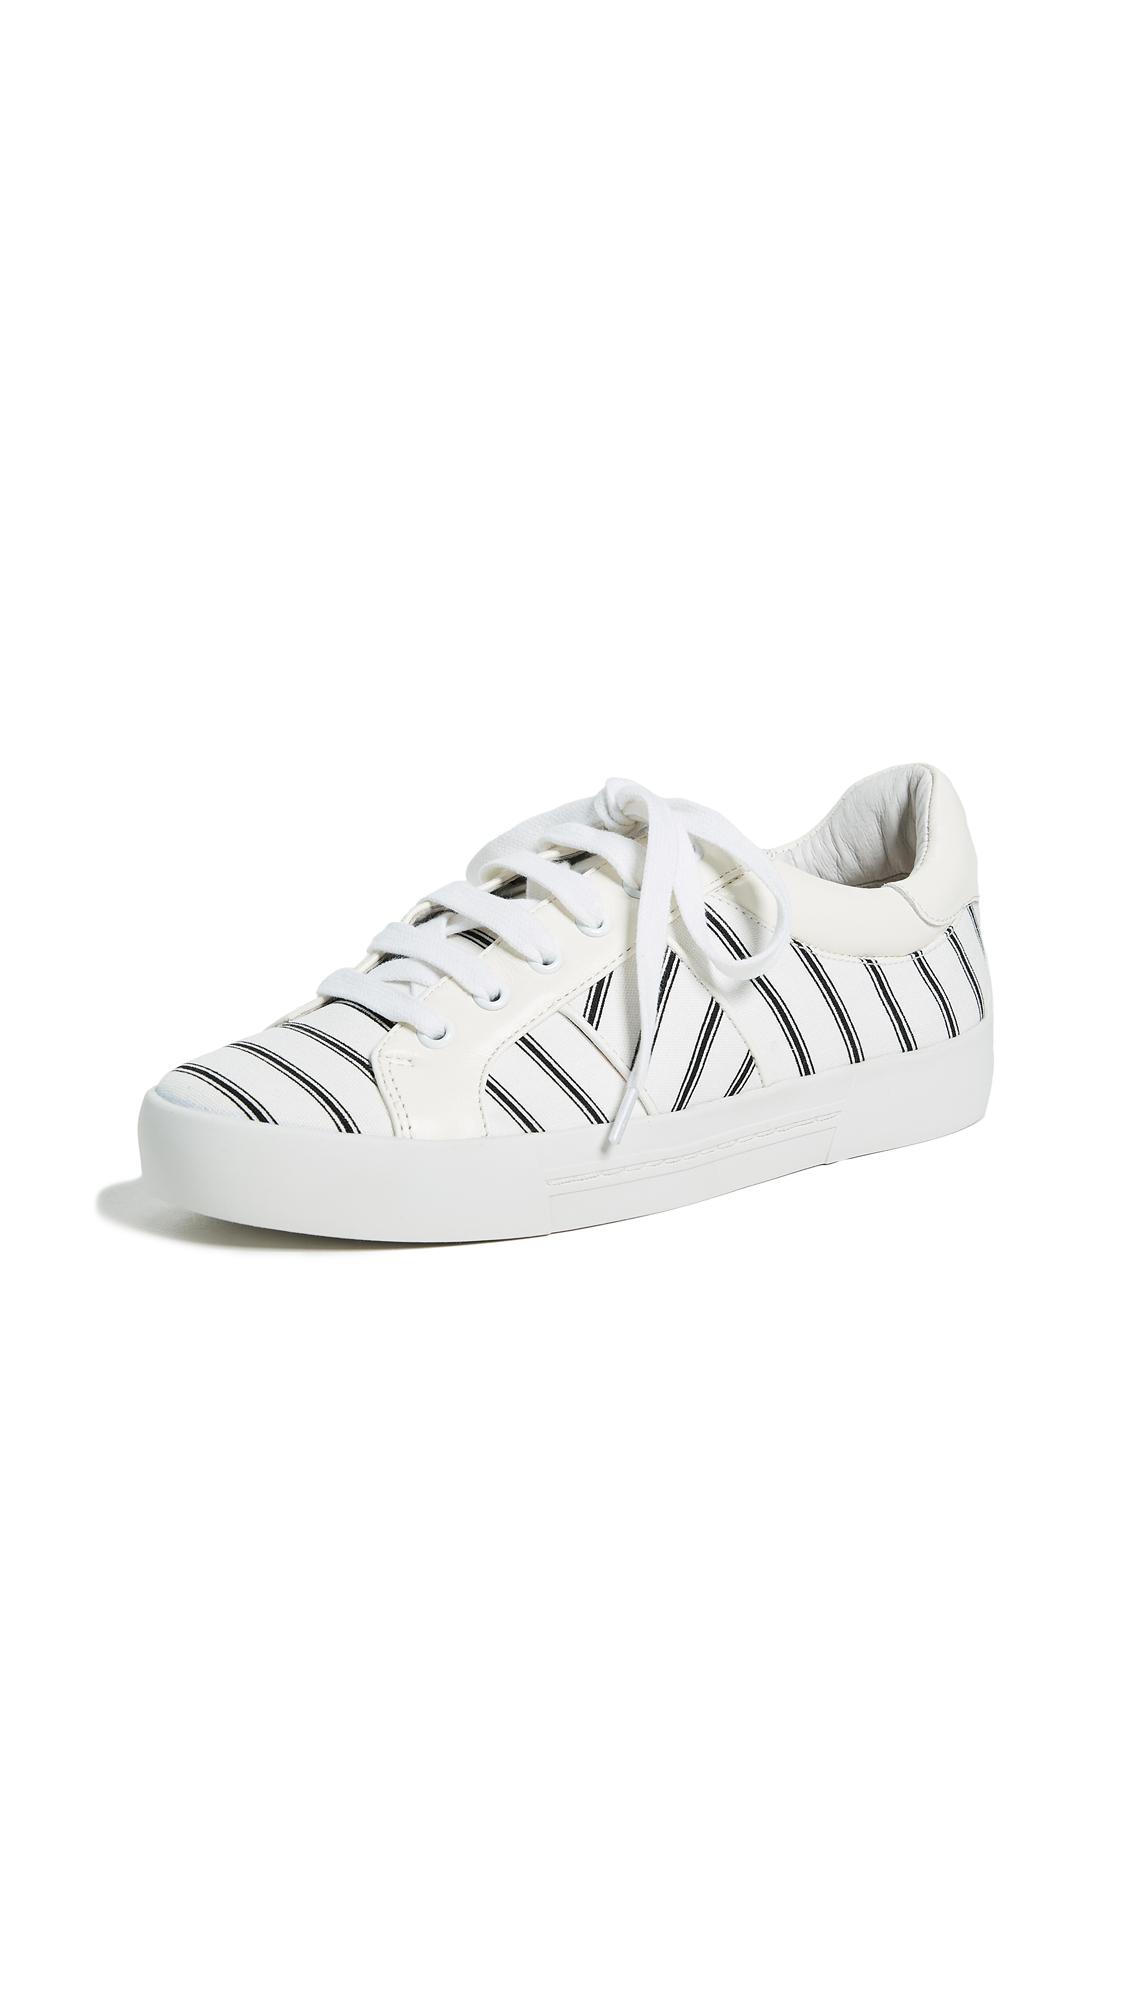 Joie Dakota Sneakers - Caviar/Porcelain